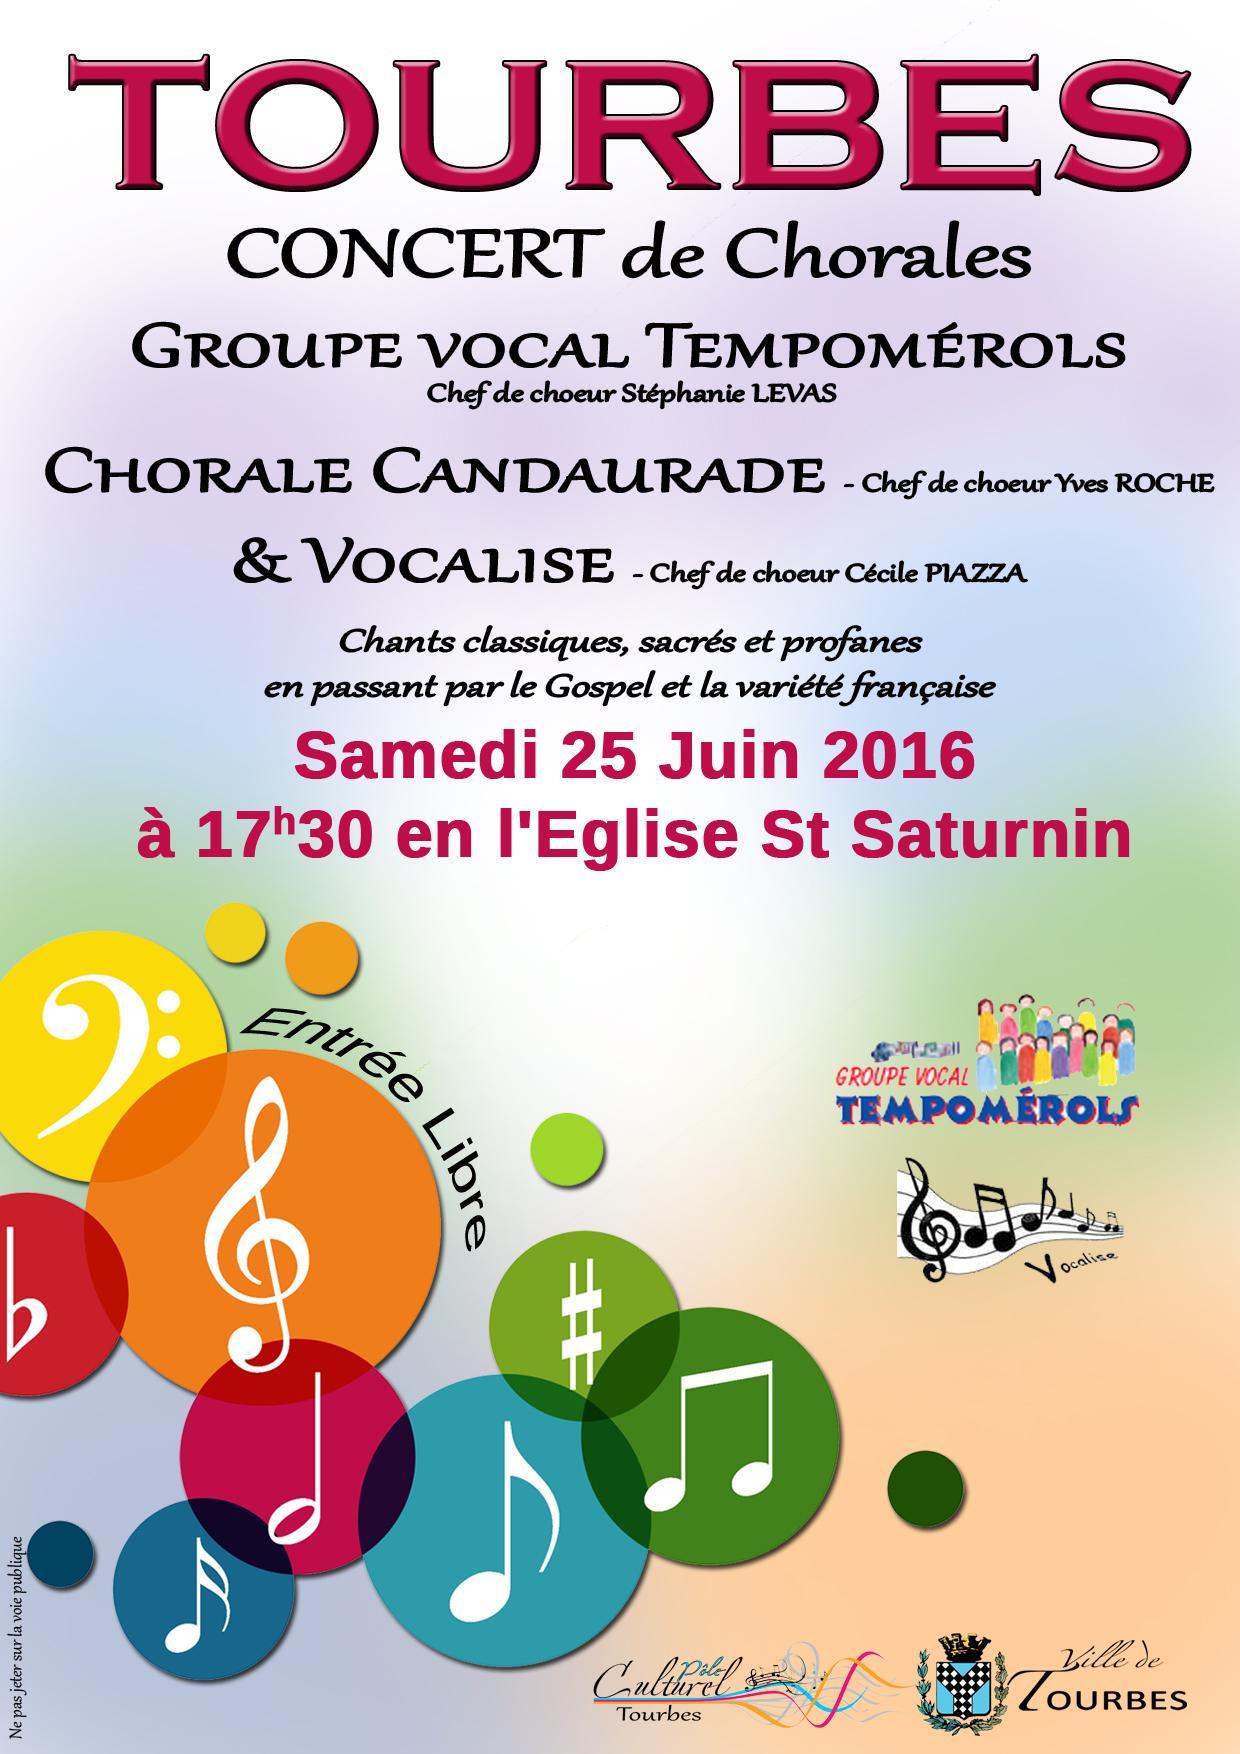 Affiche concert chorales_25.06.16 copie